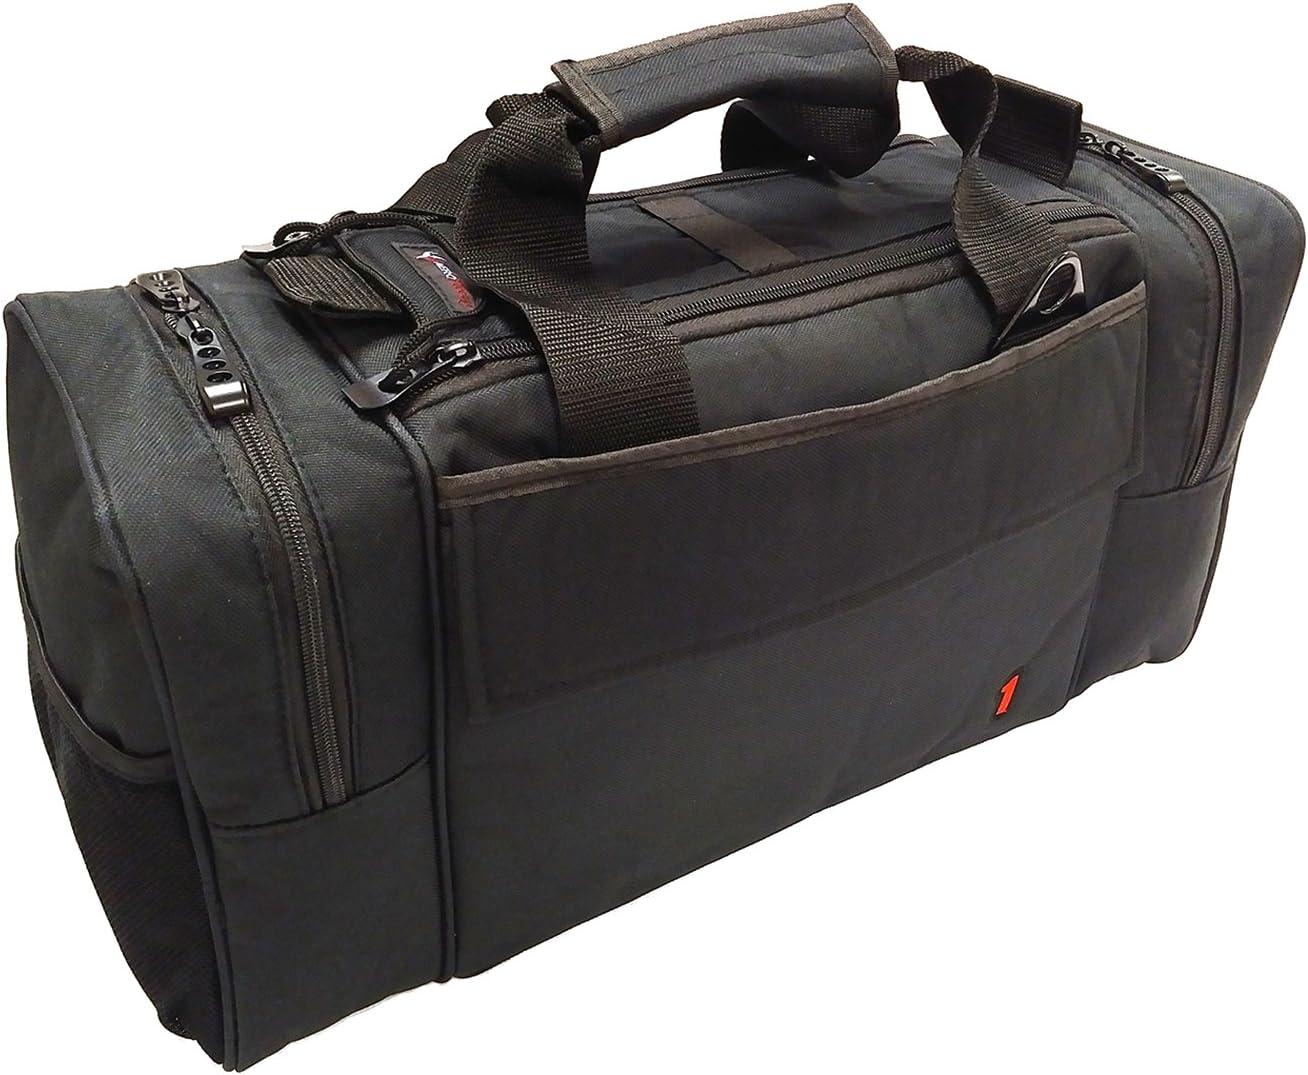 Aero Phoenix Bolsa de Vuelo 1 V2 – Bolsa de Cabina: Amazon.es ...